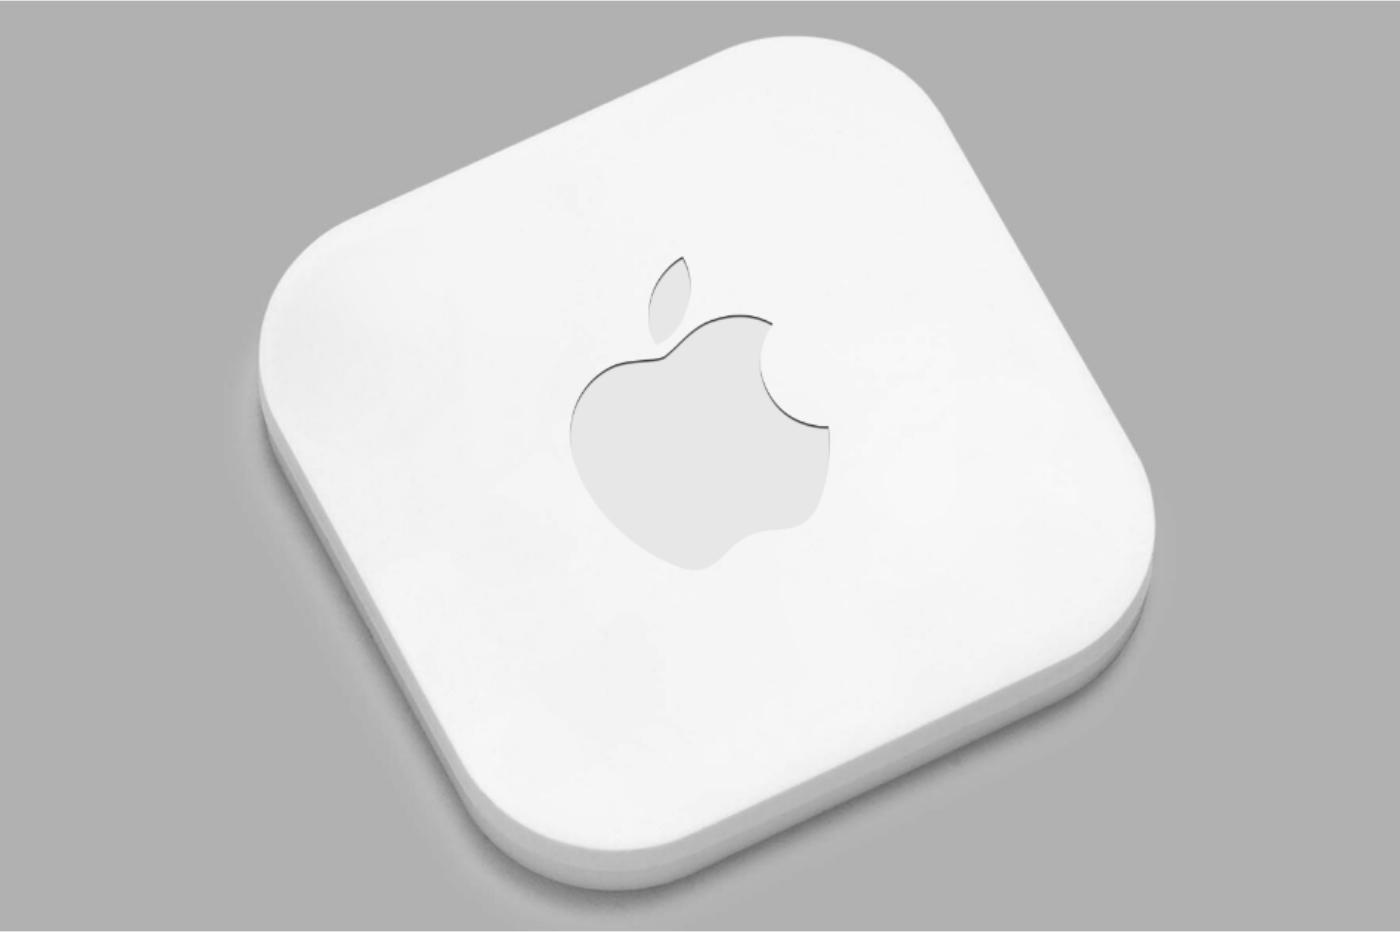 apple-airtags-prototype